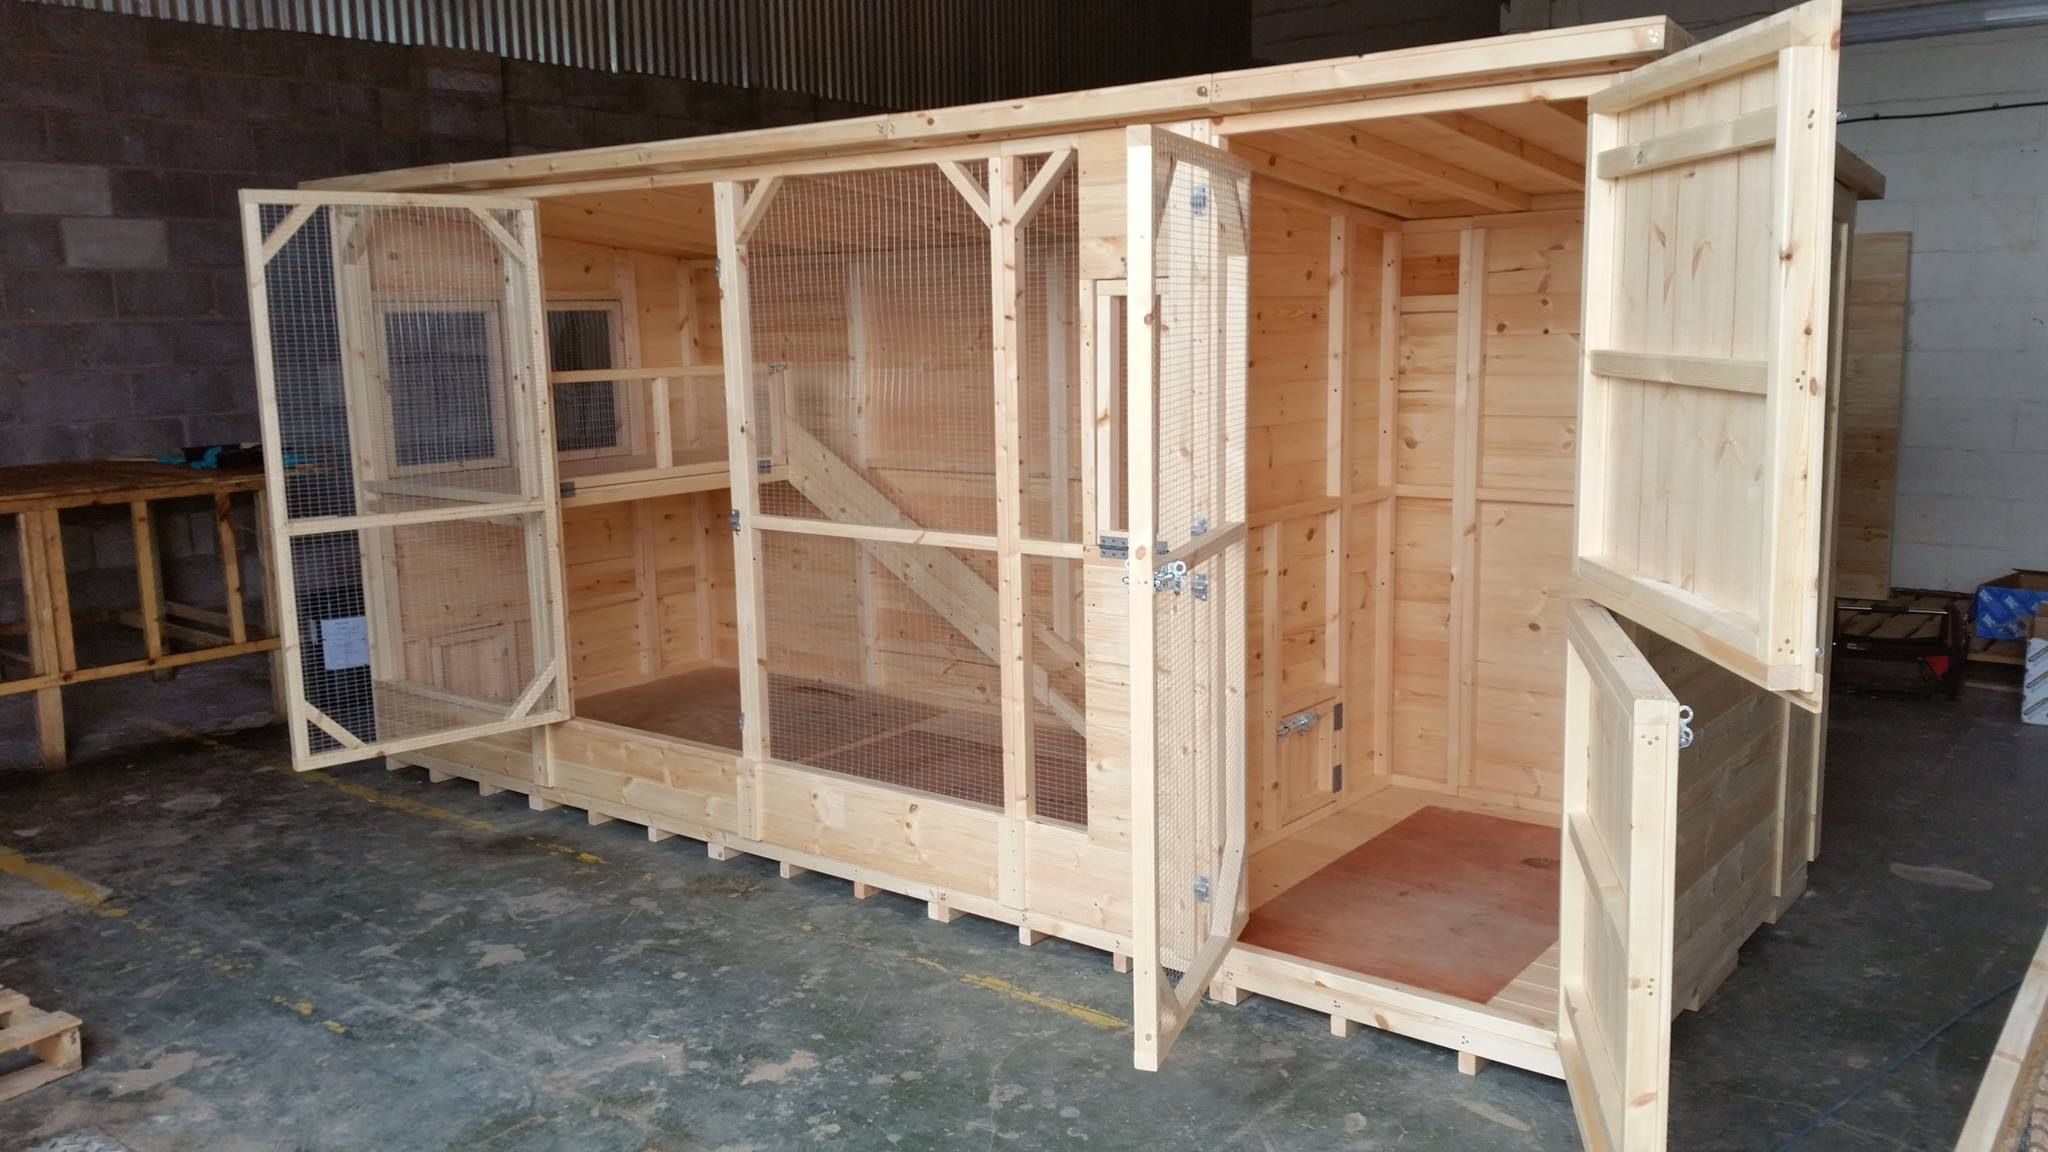 14x5x6 5ft Rabbit Kennel With Run It Has A Shelf Inside The Run